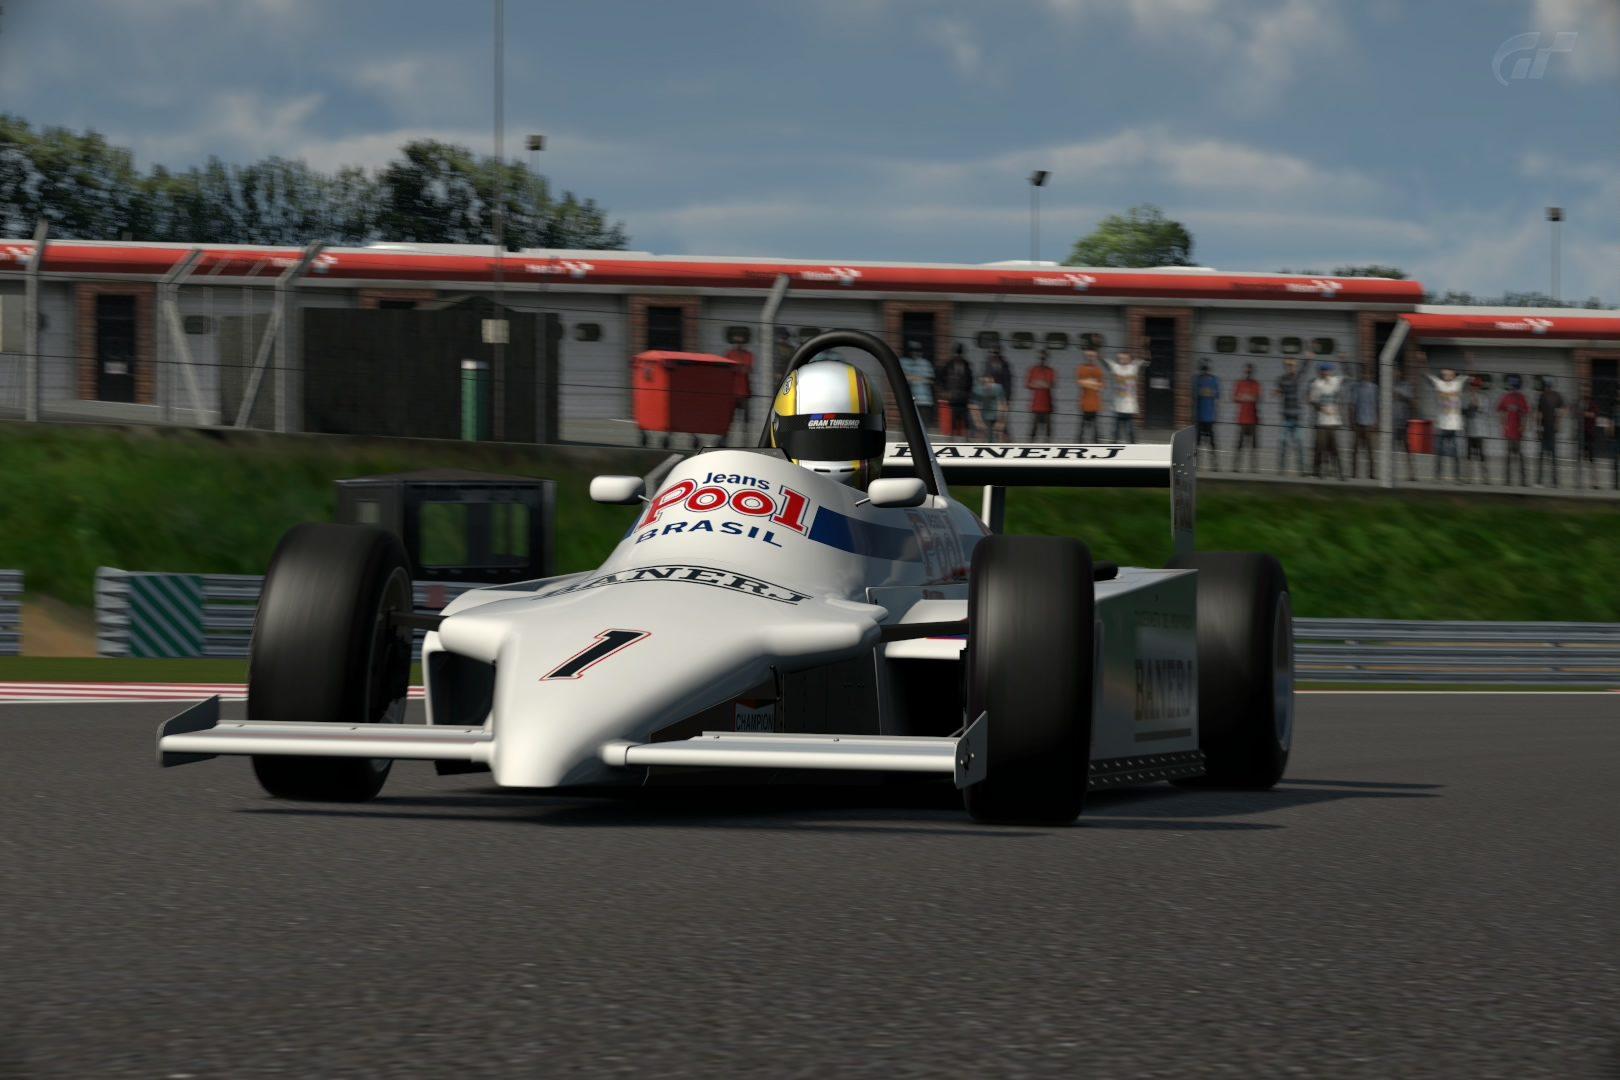 Brands Hatch Grand Prix Circuit '80s_7.jpg